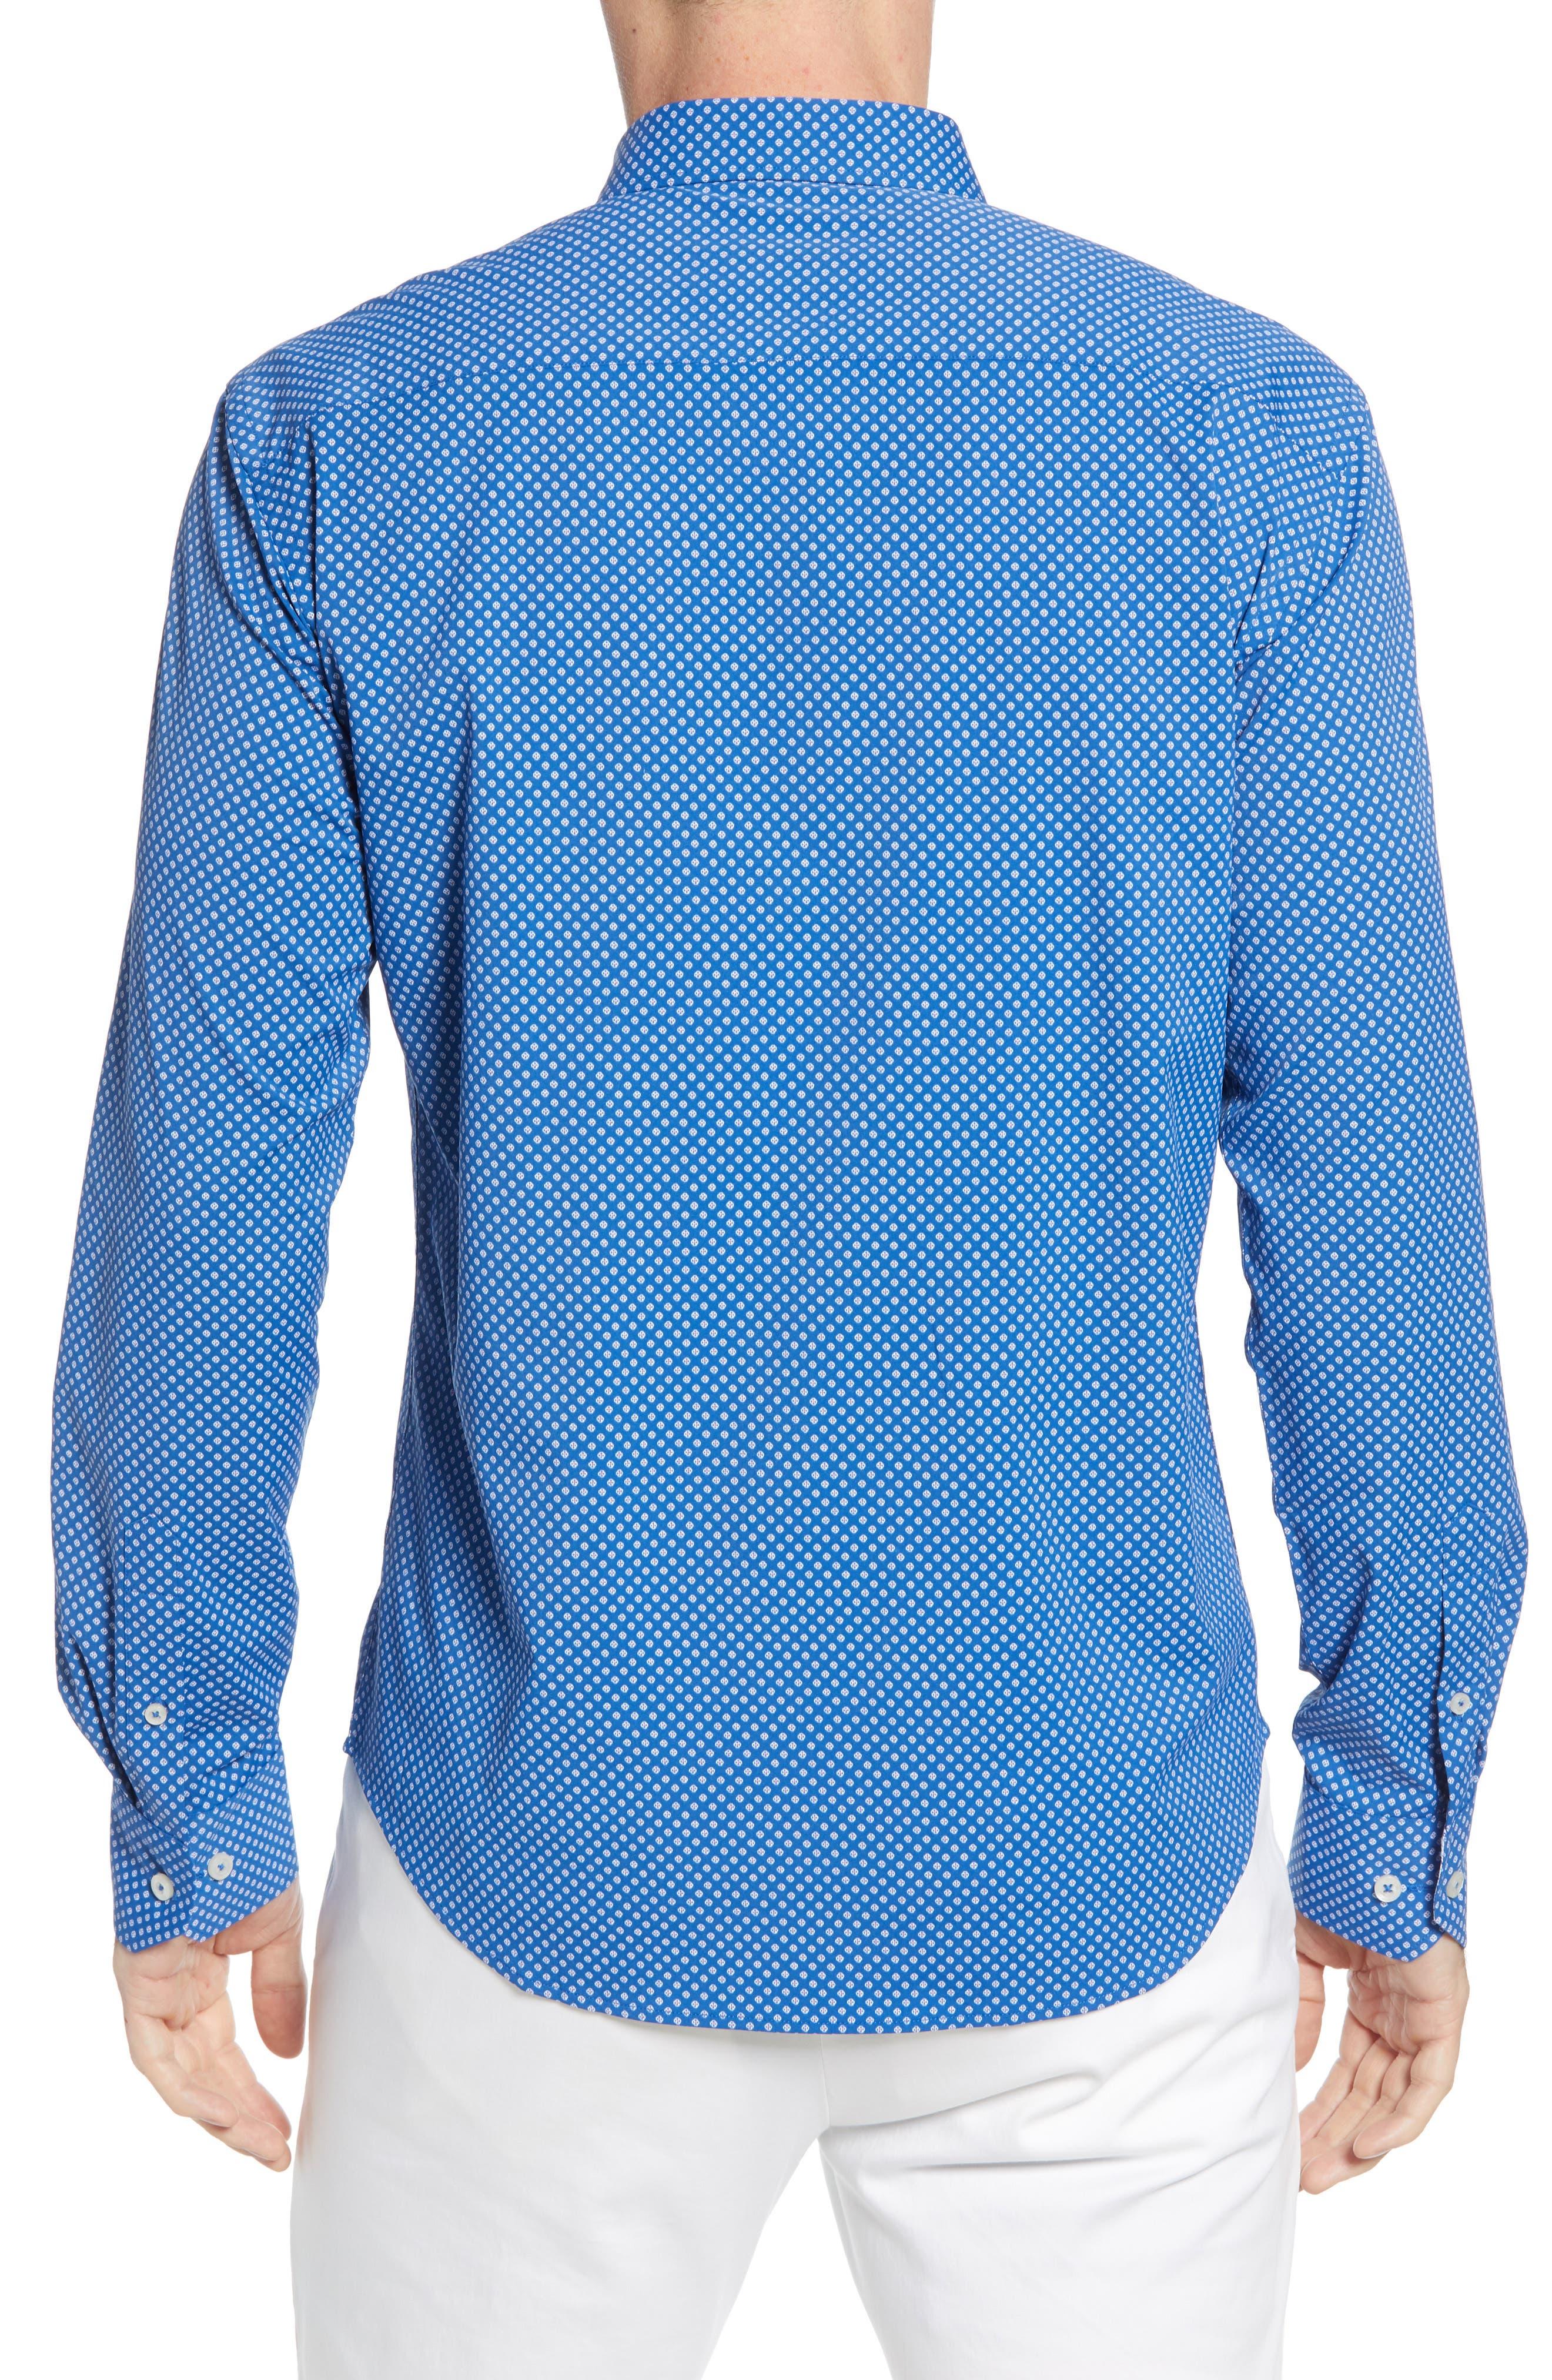 BUGATCHI, Shaped Fit Print Performance Sport Shirt, Alternate thumbnail 3, color, NAVY